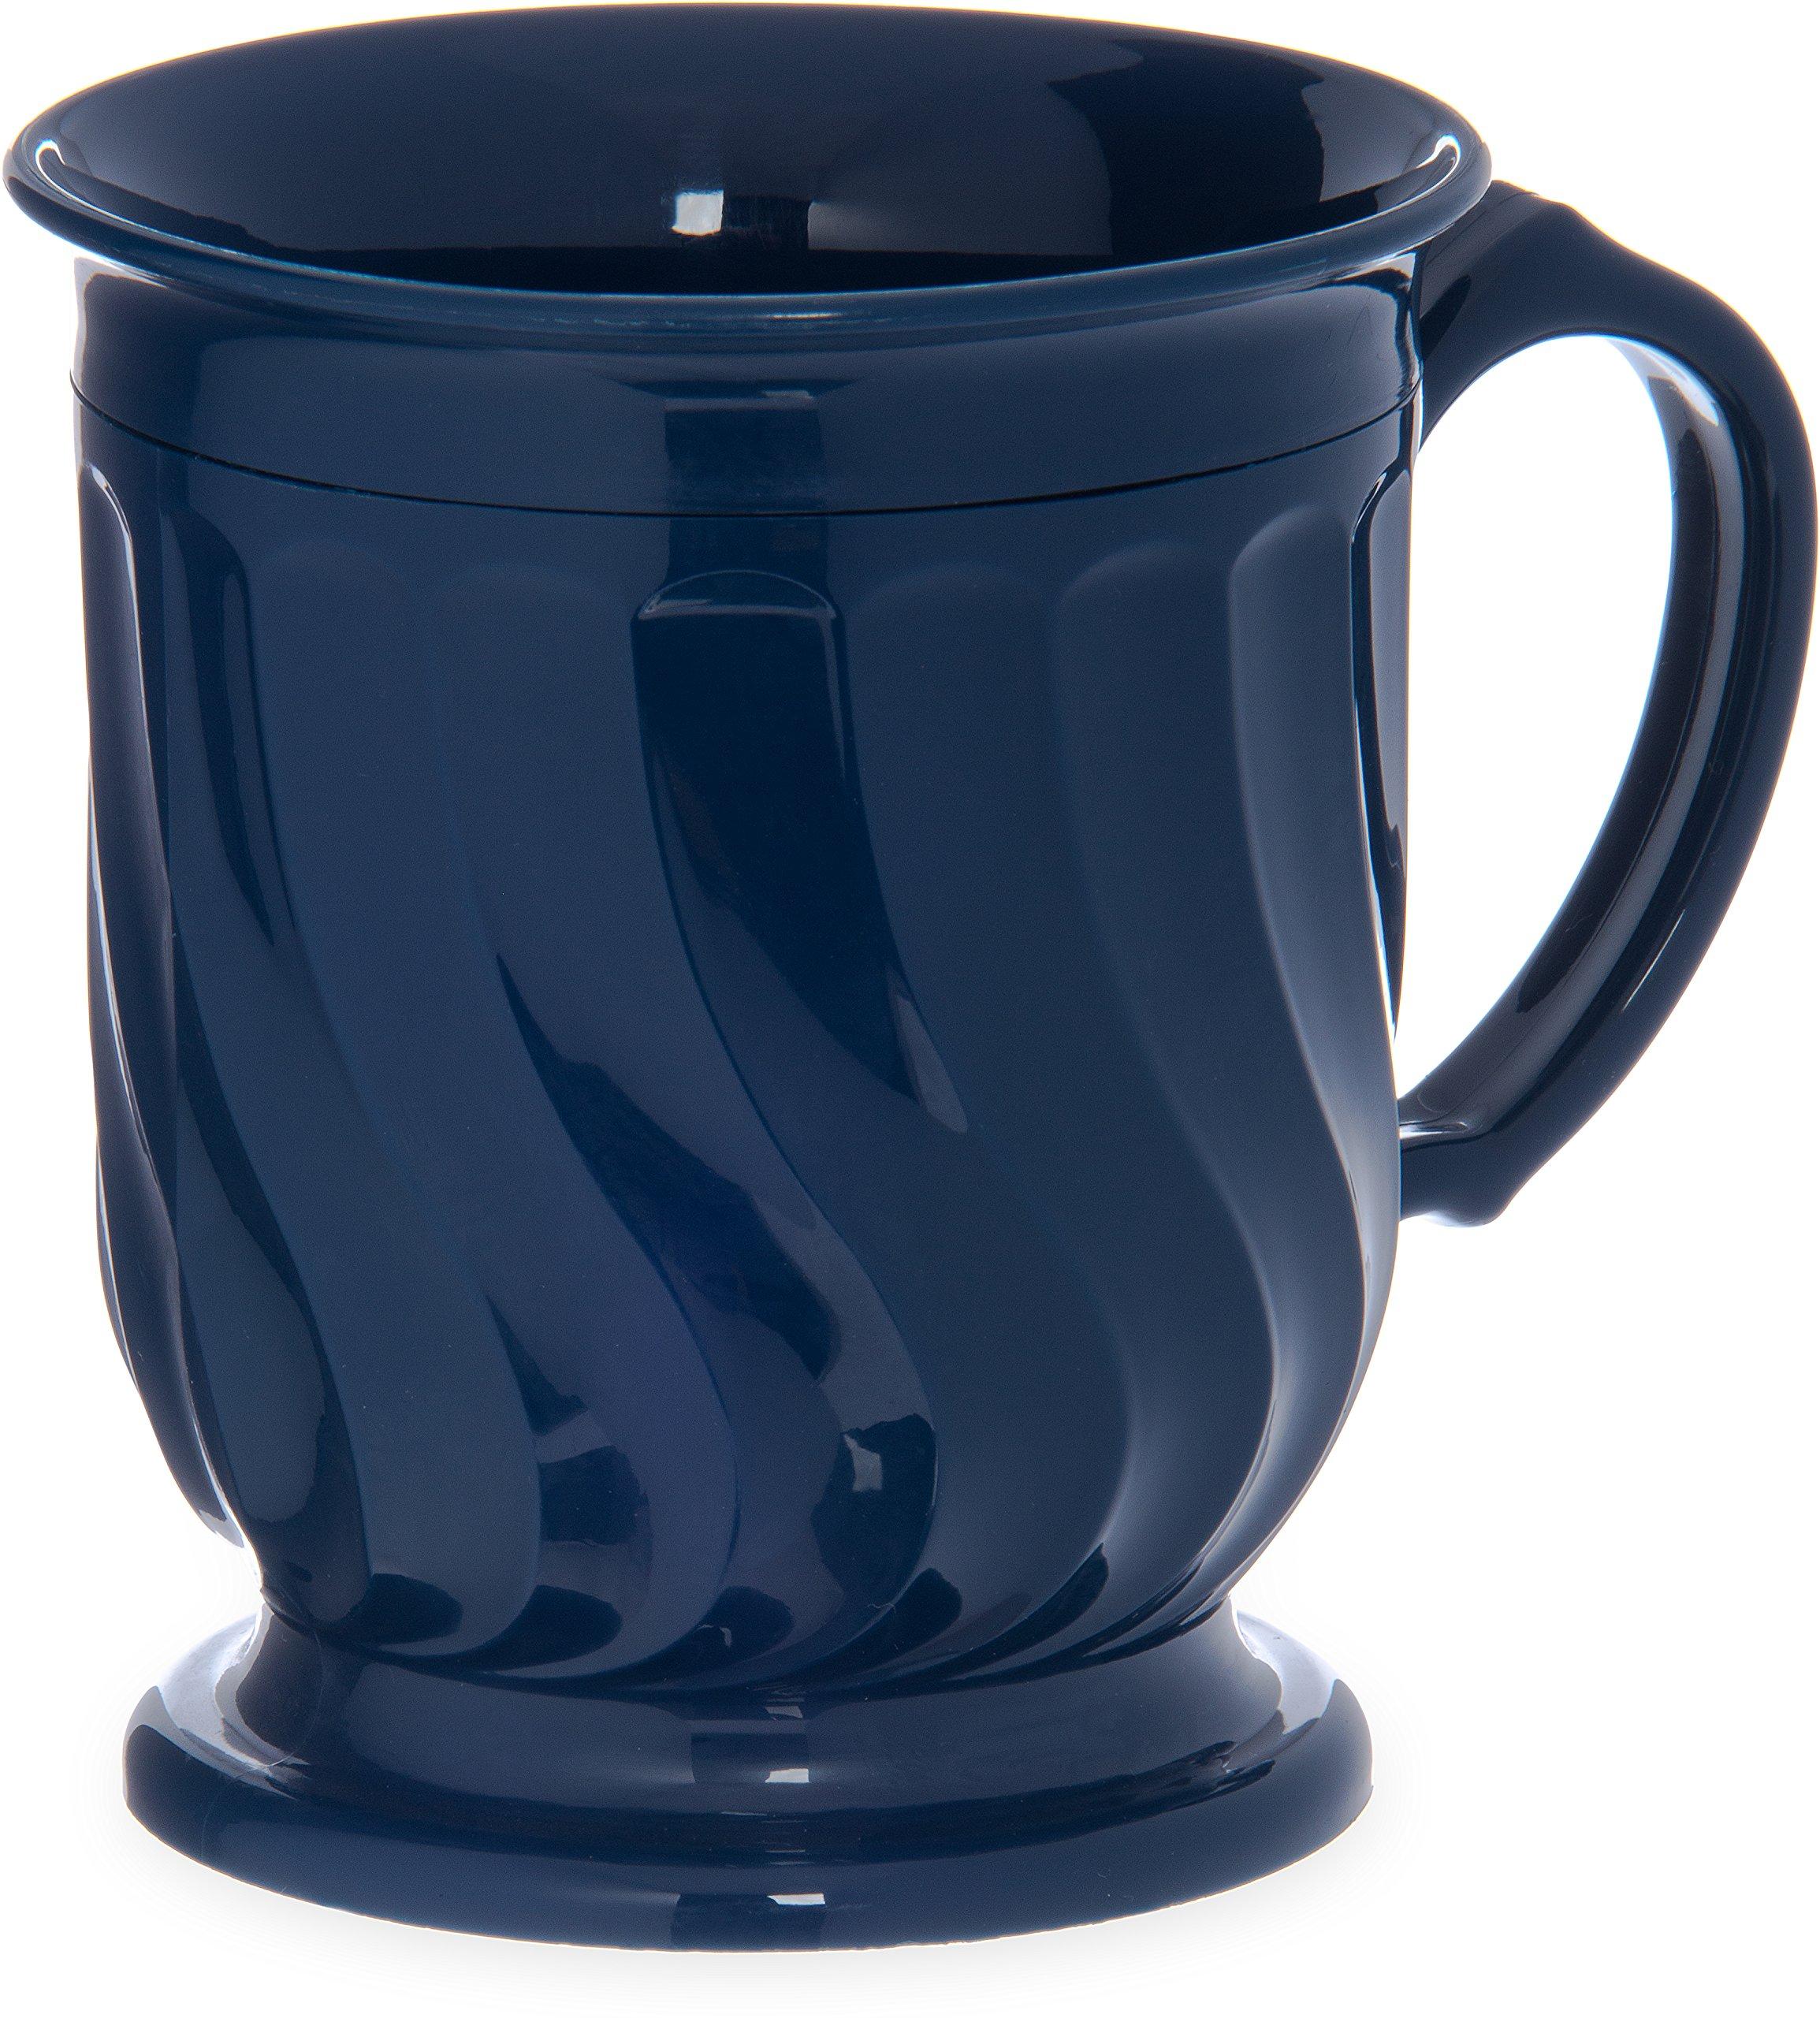 Dinex DX300050 Turnbury Insulated Pedestal Base Mug, 8 oz., 4'' Height, 3.5'' Width, 3.5'' Length, Urethane Foam, Dark Blue (Pack of 48)